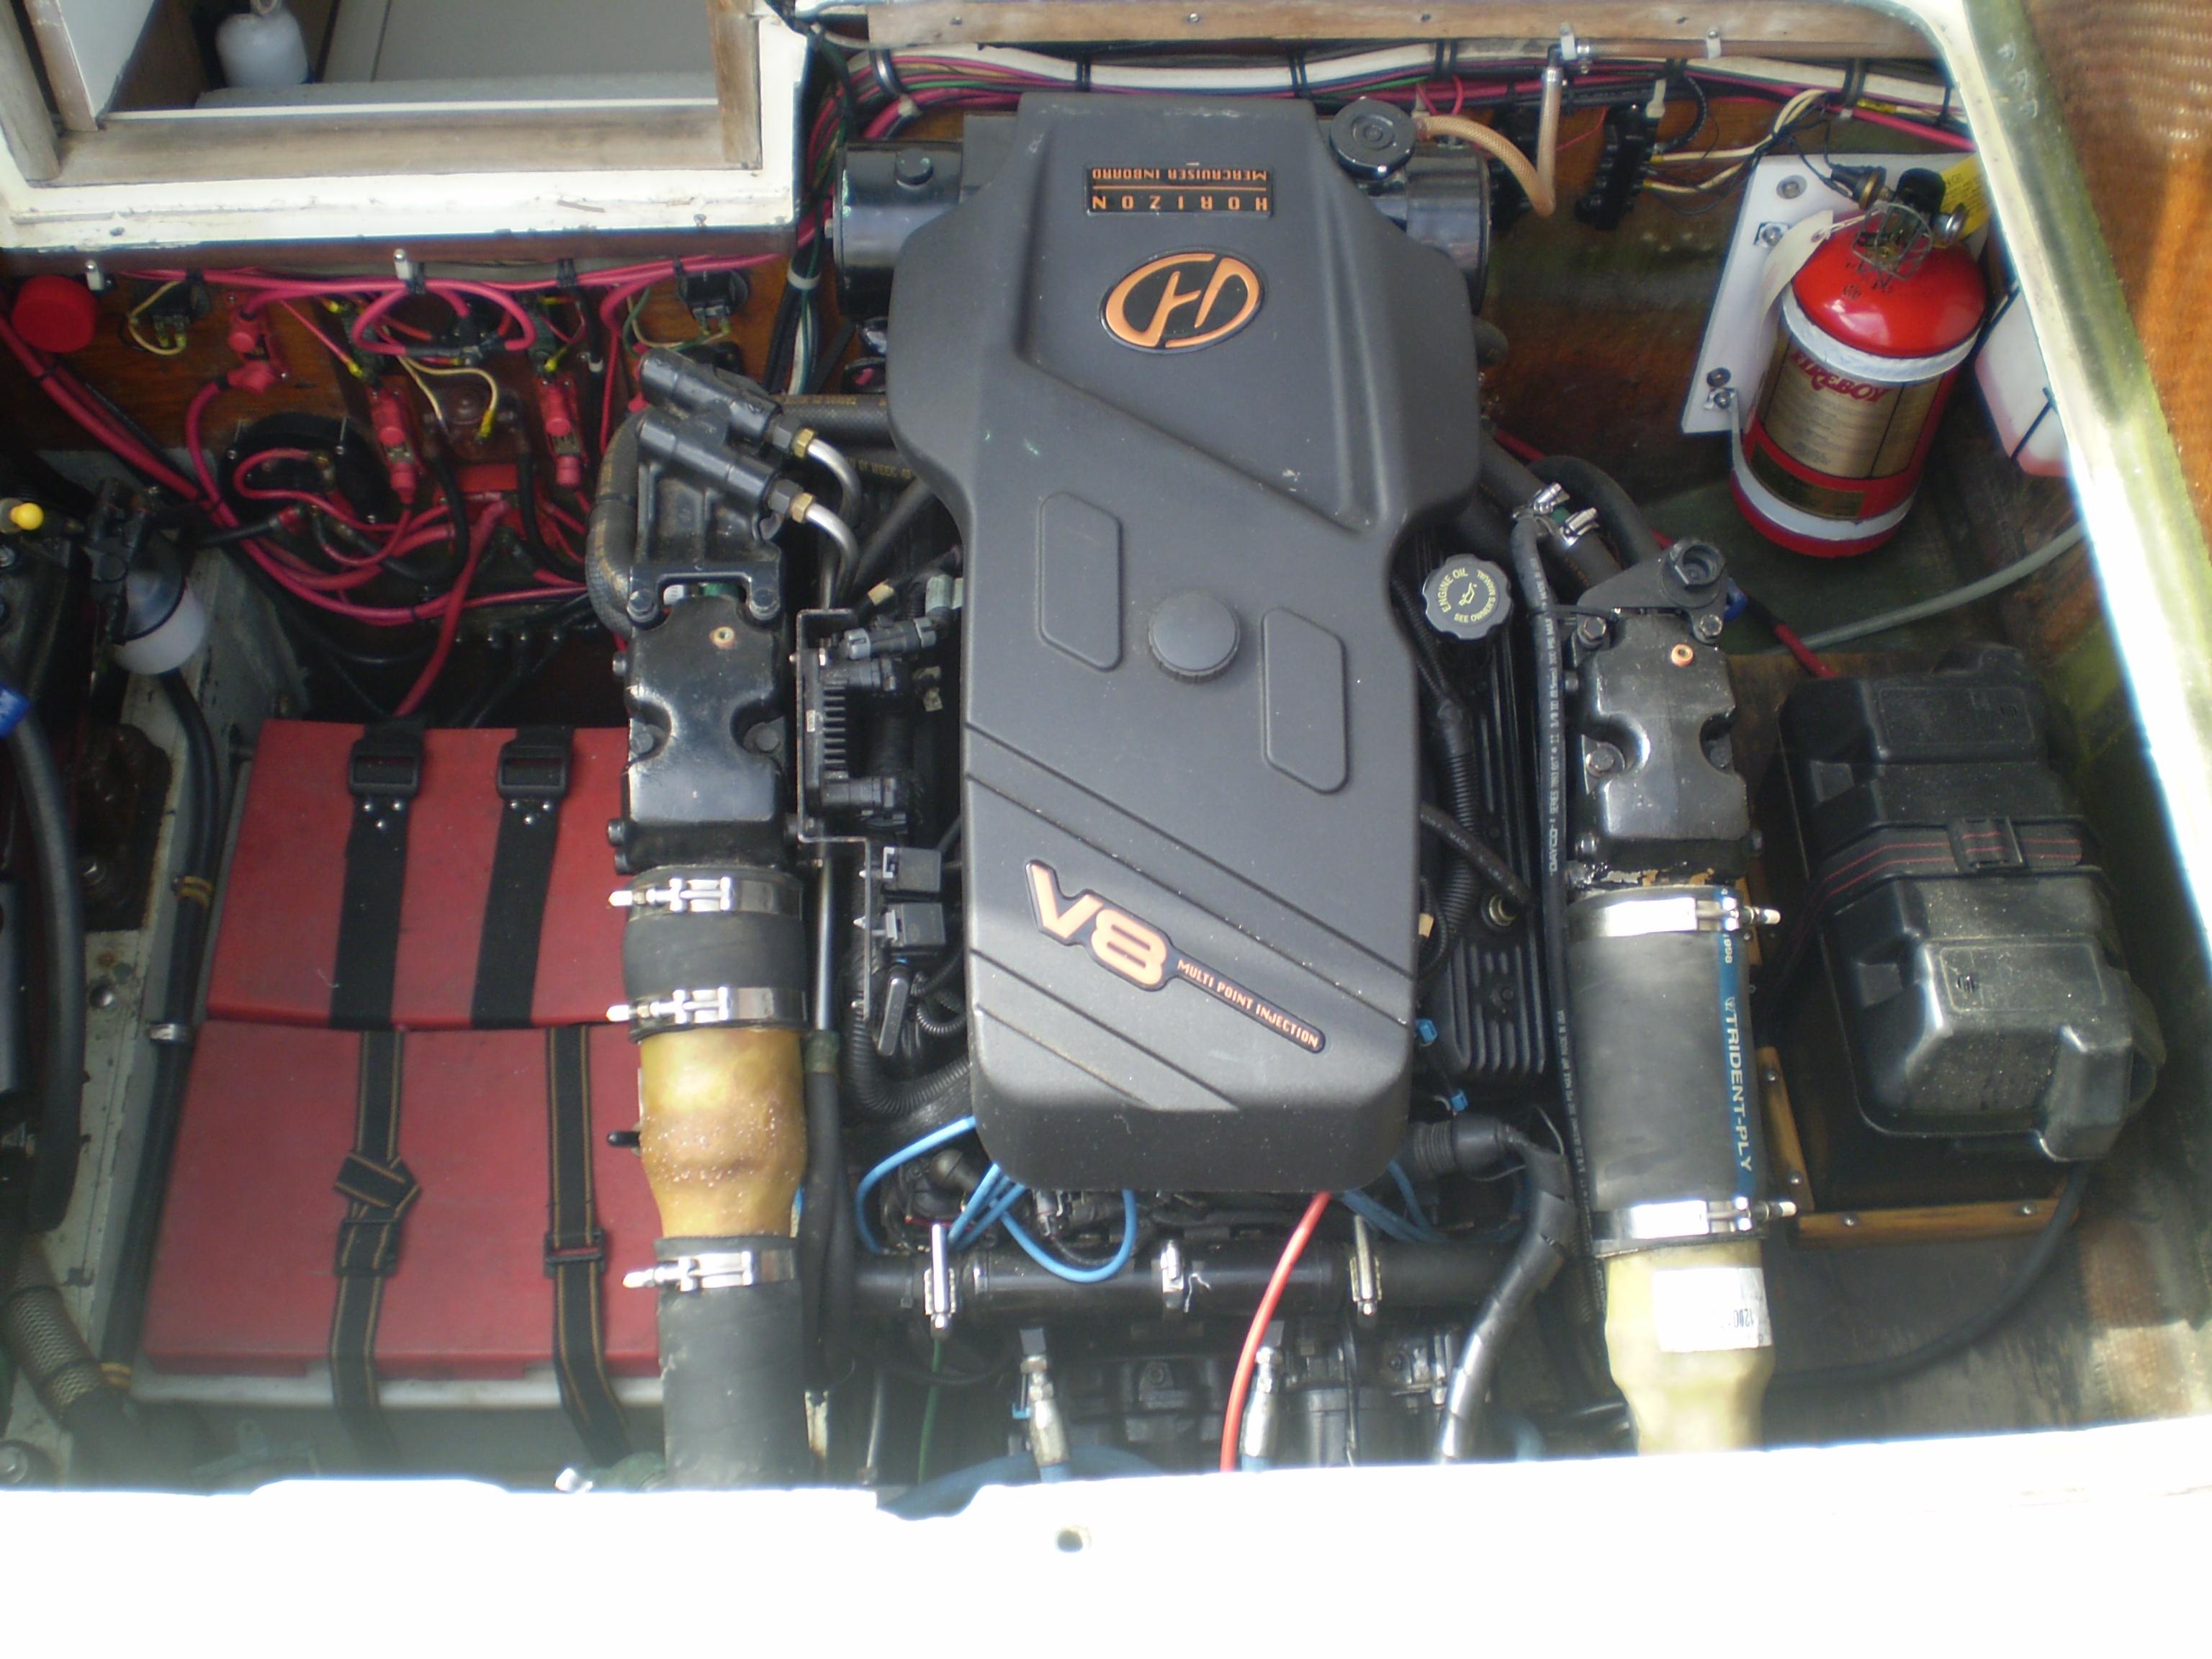 106 Cub Cadet Parts Diagram Electrical Wiring Lt1024 Lt 1050 582 Clutch Assembly Ih